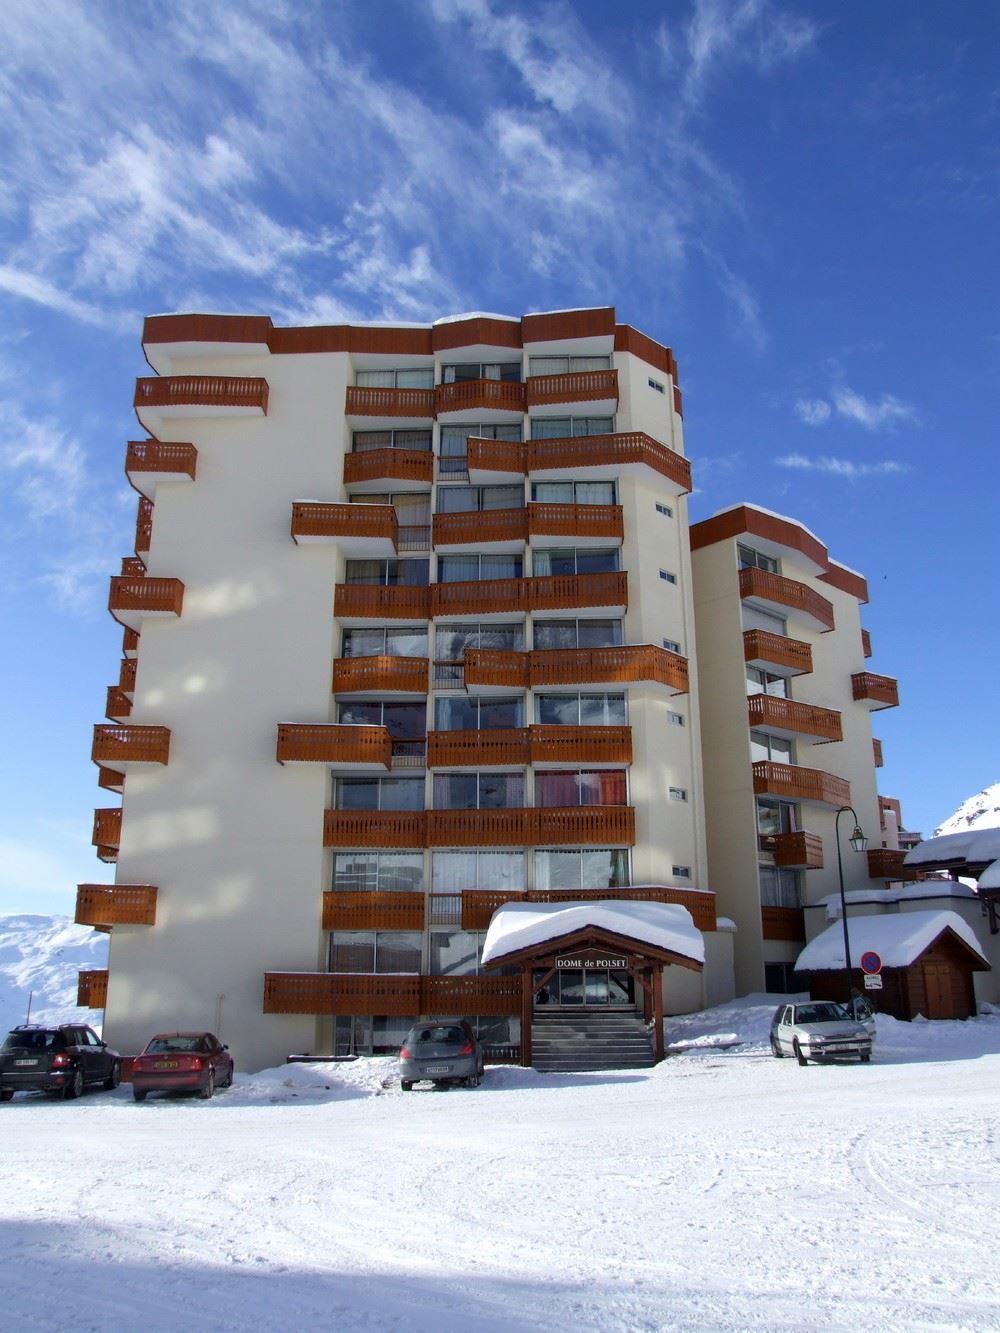 DOME DE POLSET 309 / STUDIO 3 PEOPLE COMFORT - 1 SNOW FLAKE BRONZE - VTI